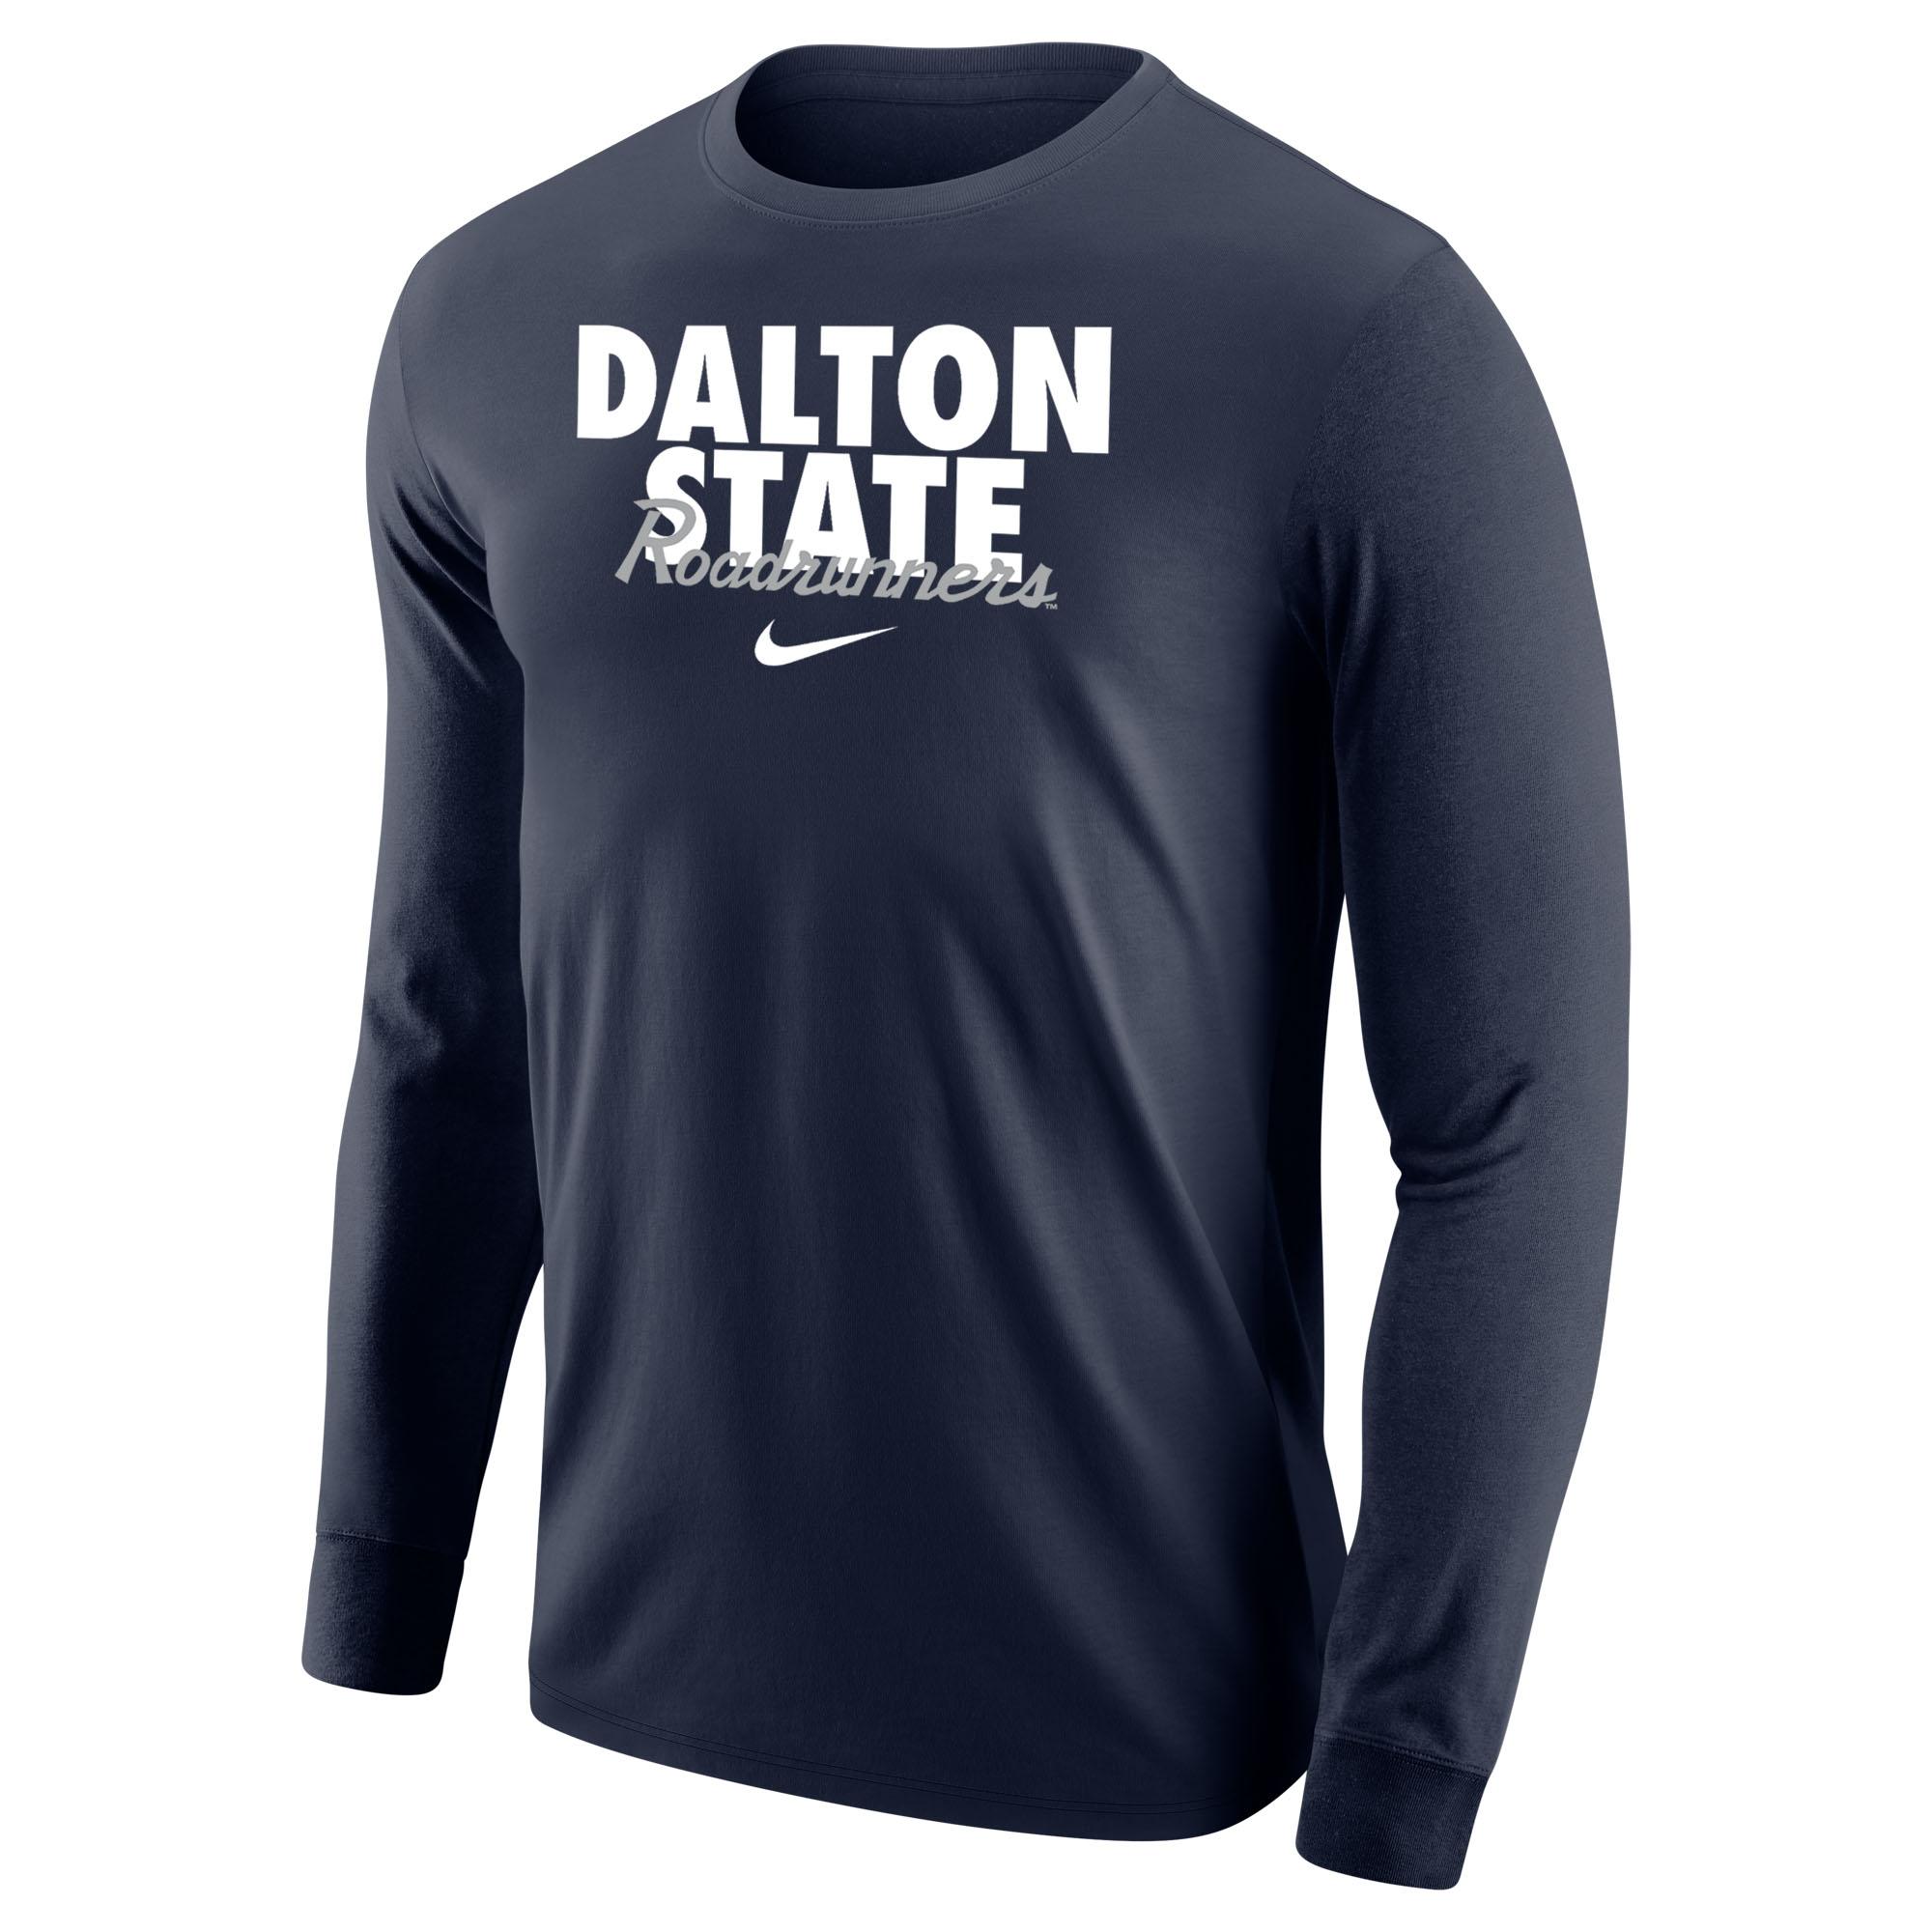 Dalton State Roadrunners Nike® Core Long Sleeve Shirt